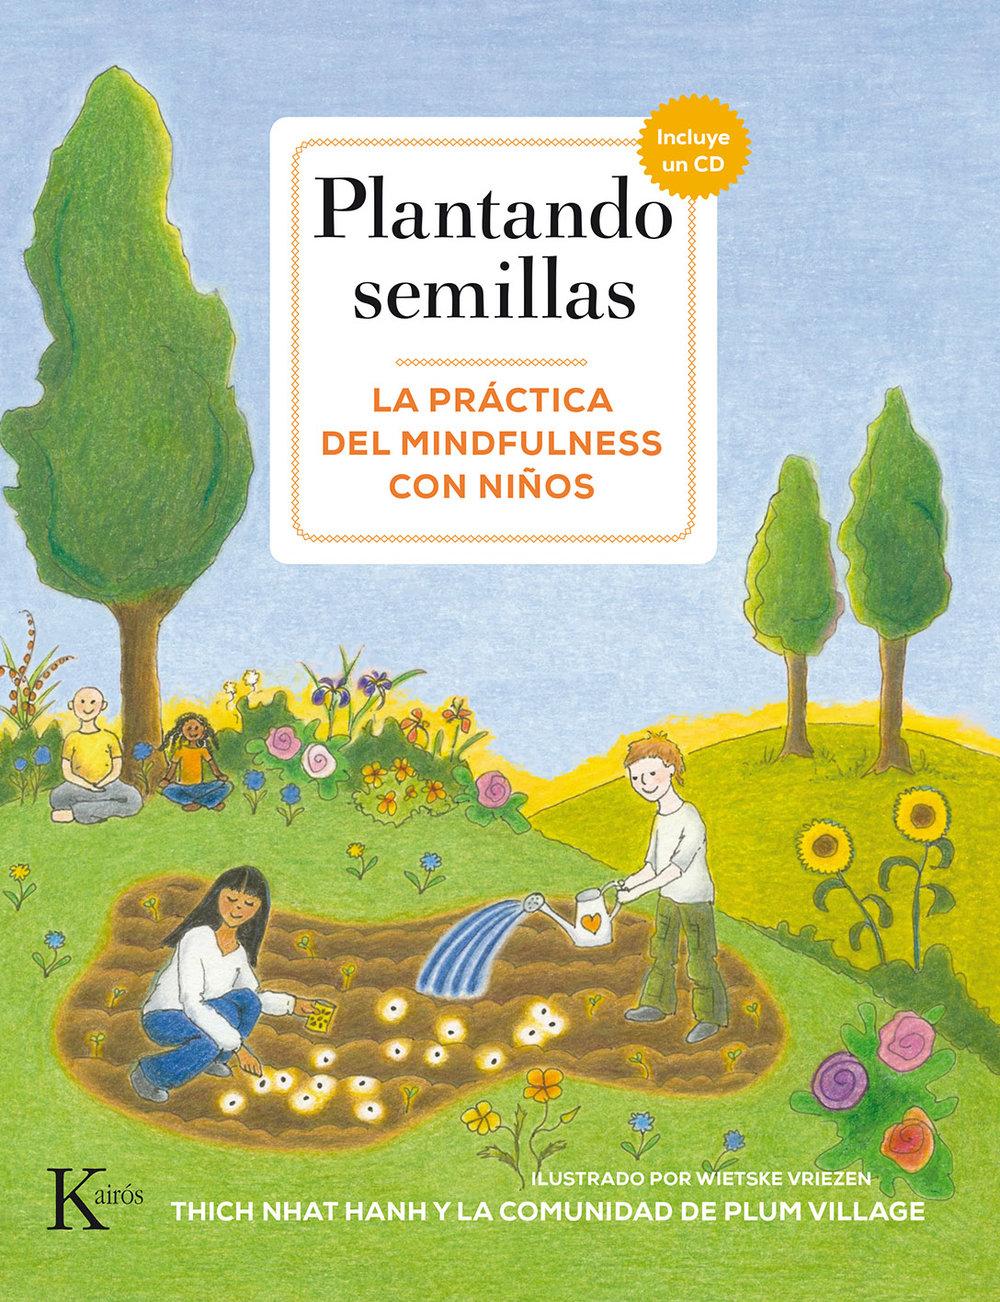 Plantando_semillas_mindfulness.jpg